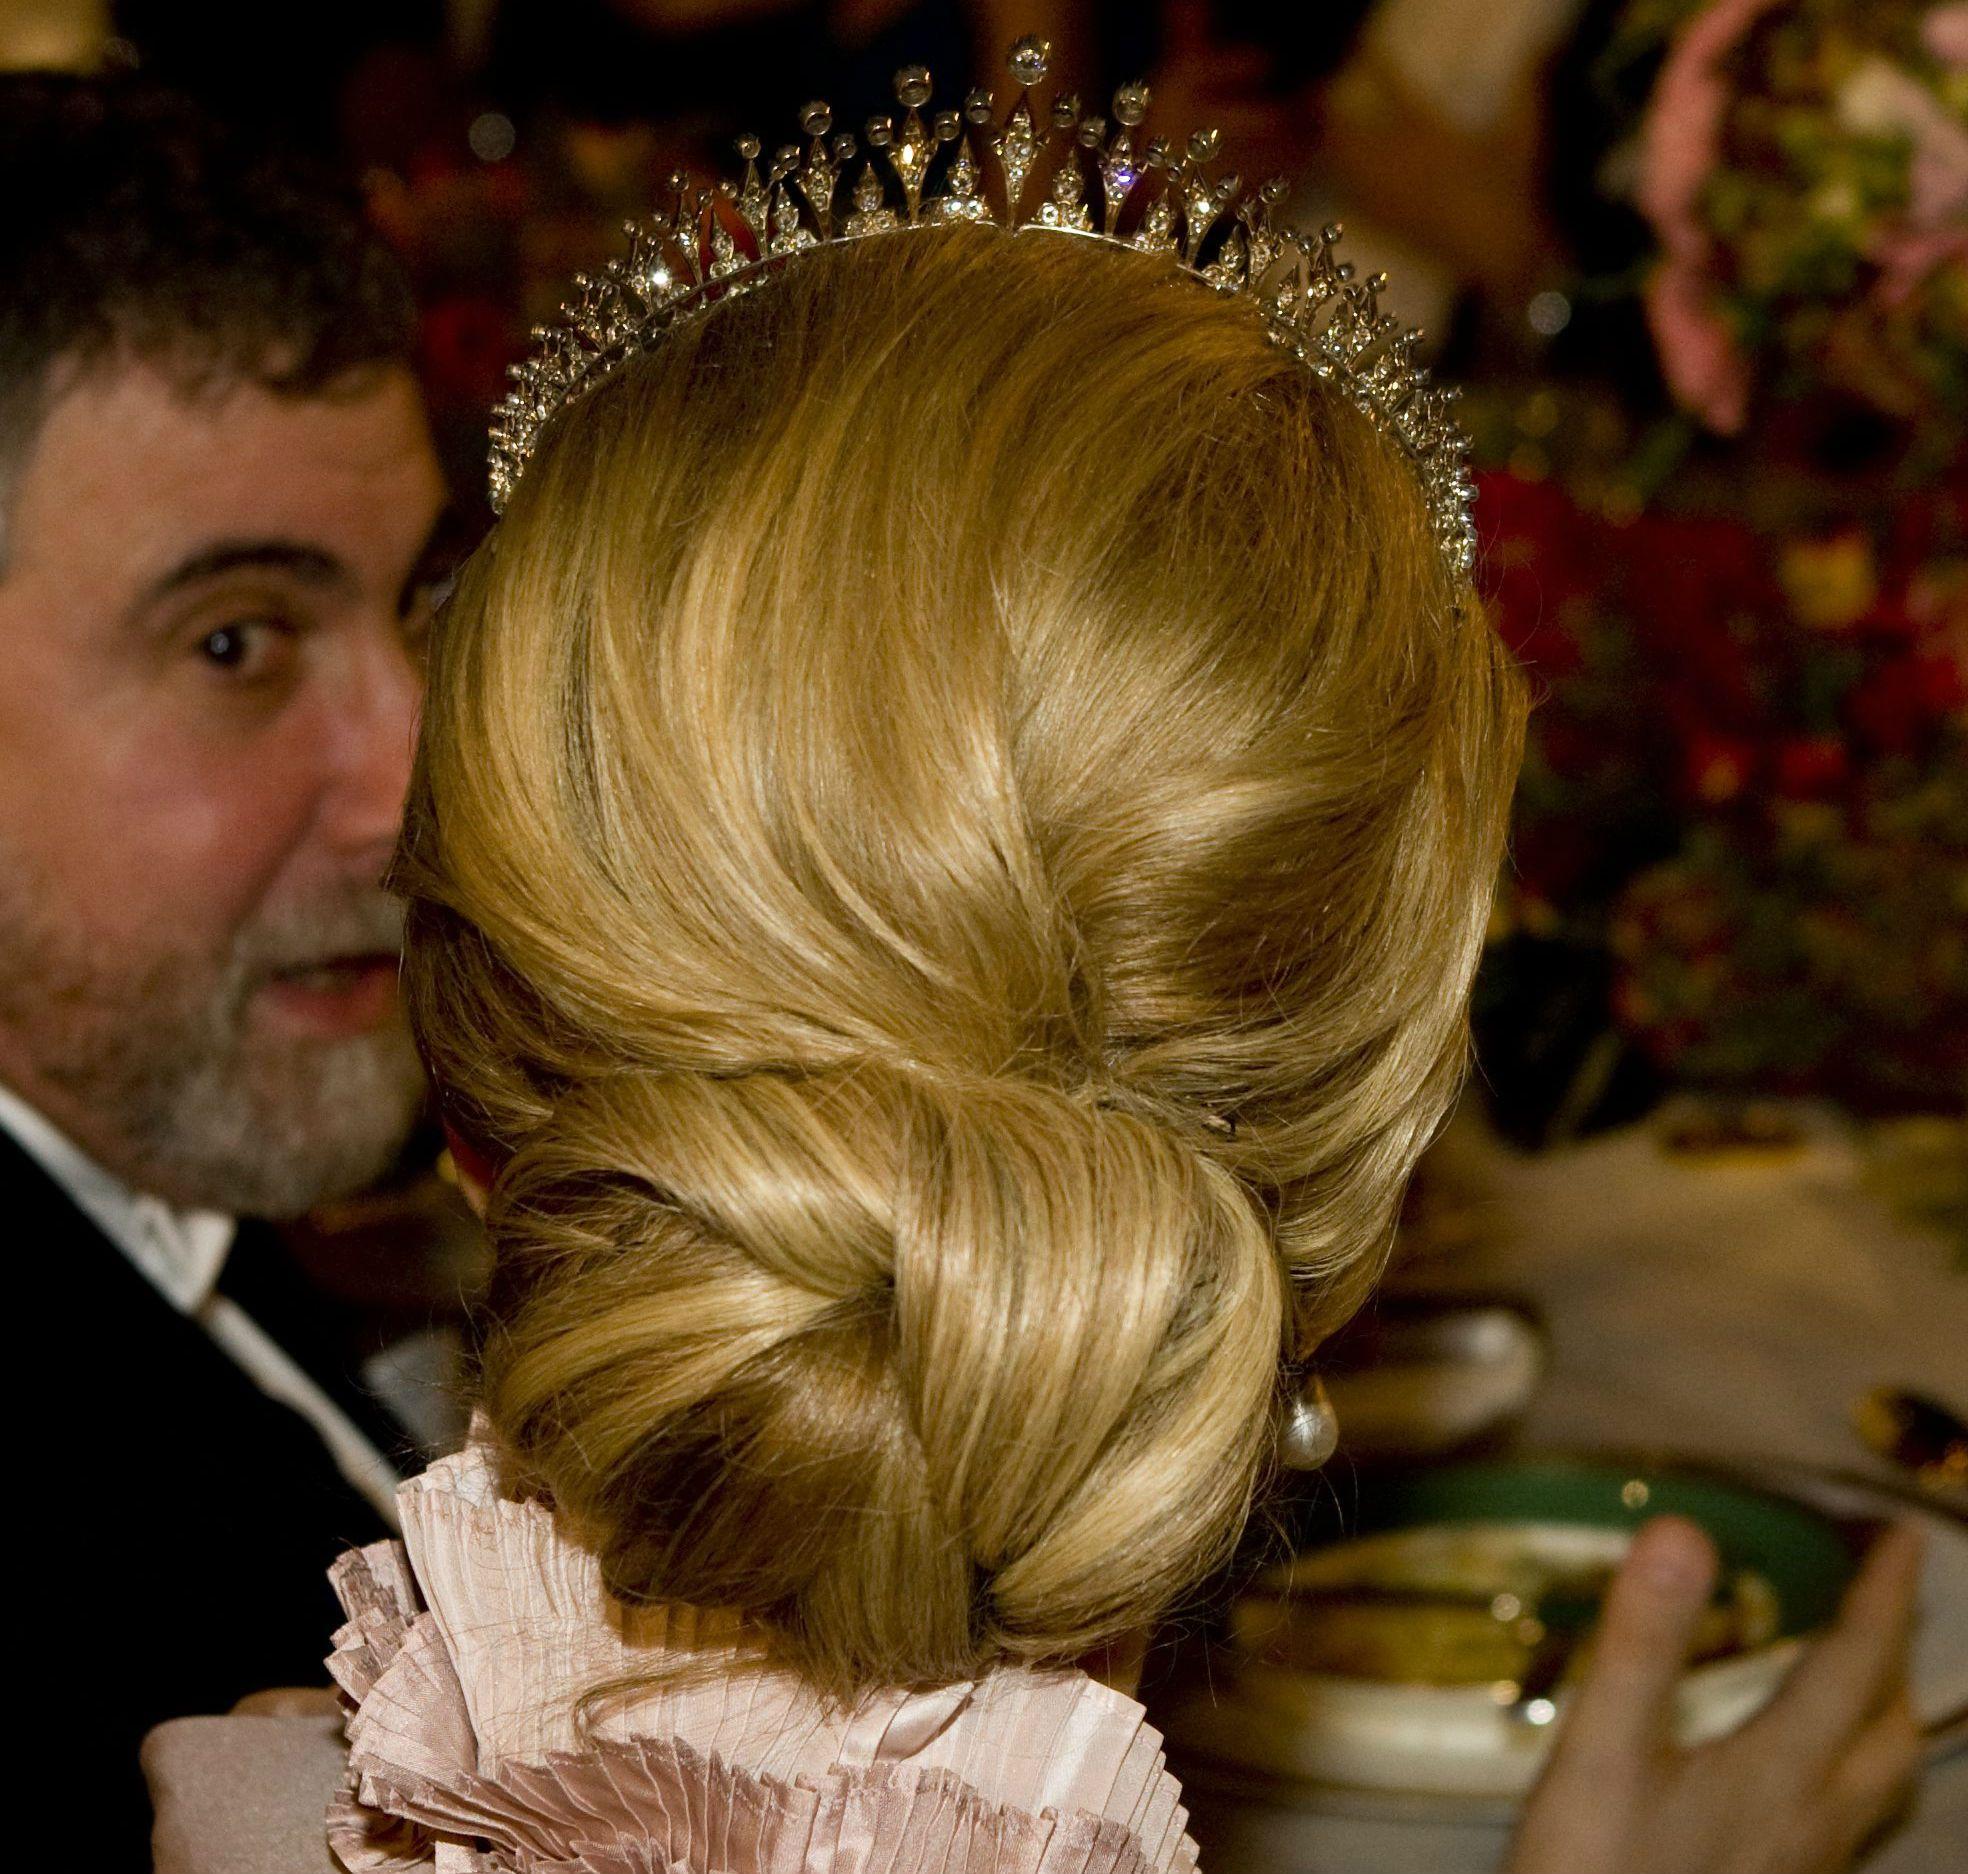 Hemligheterna Bakom Nobelfrisyrerna Brautfrisur Prinzessin Madeleine Royale Hochzeiten